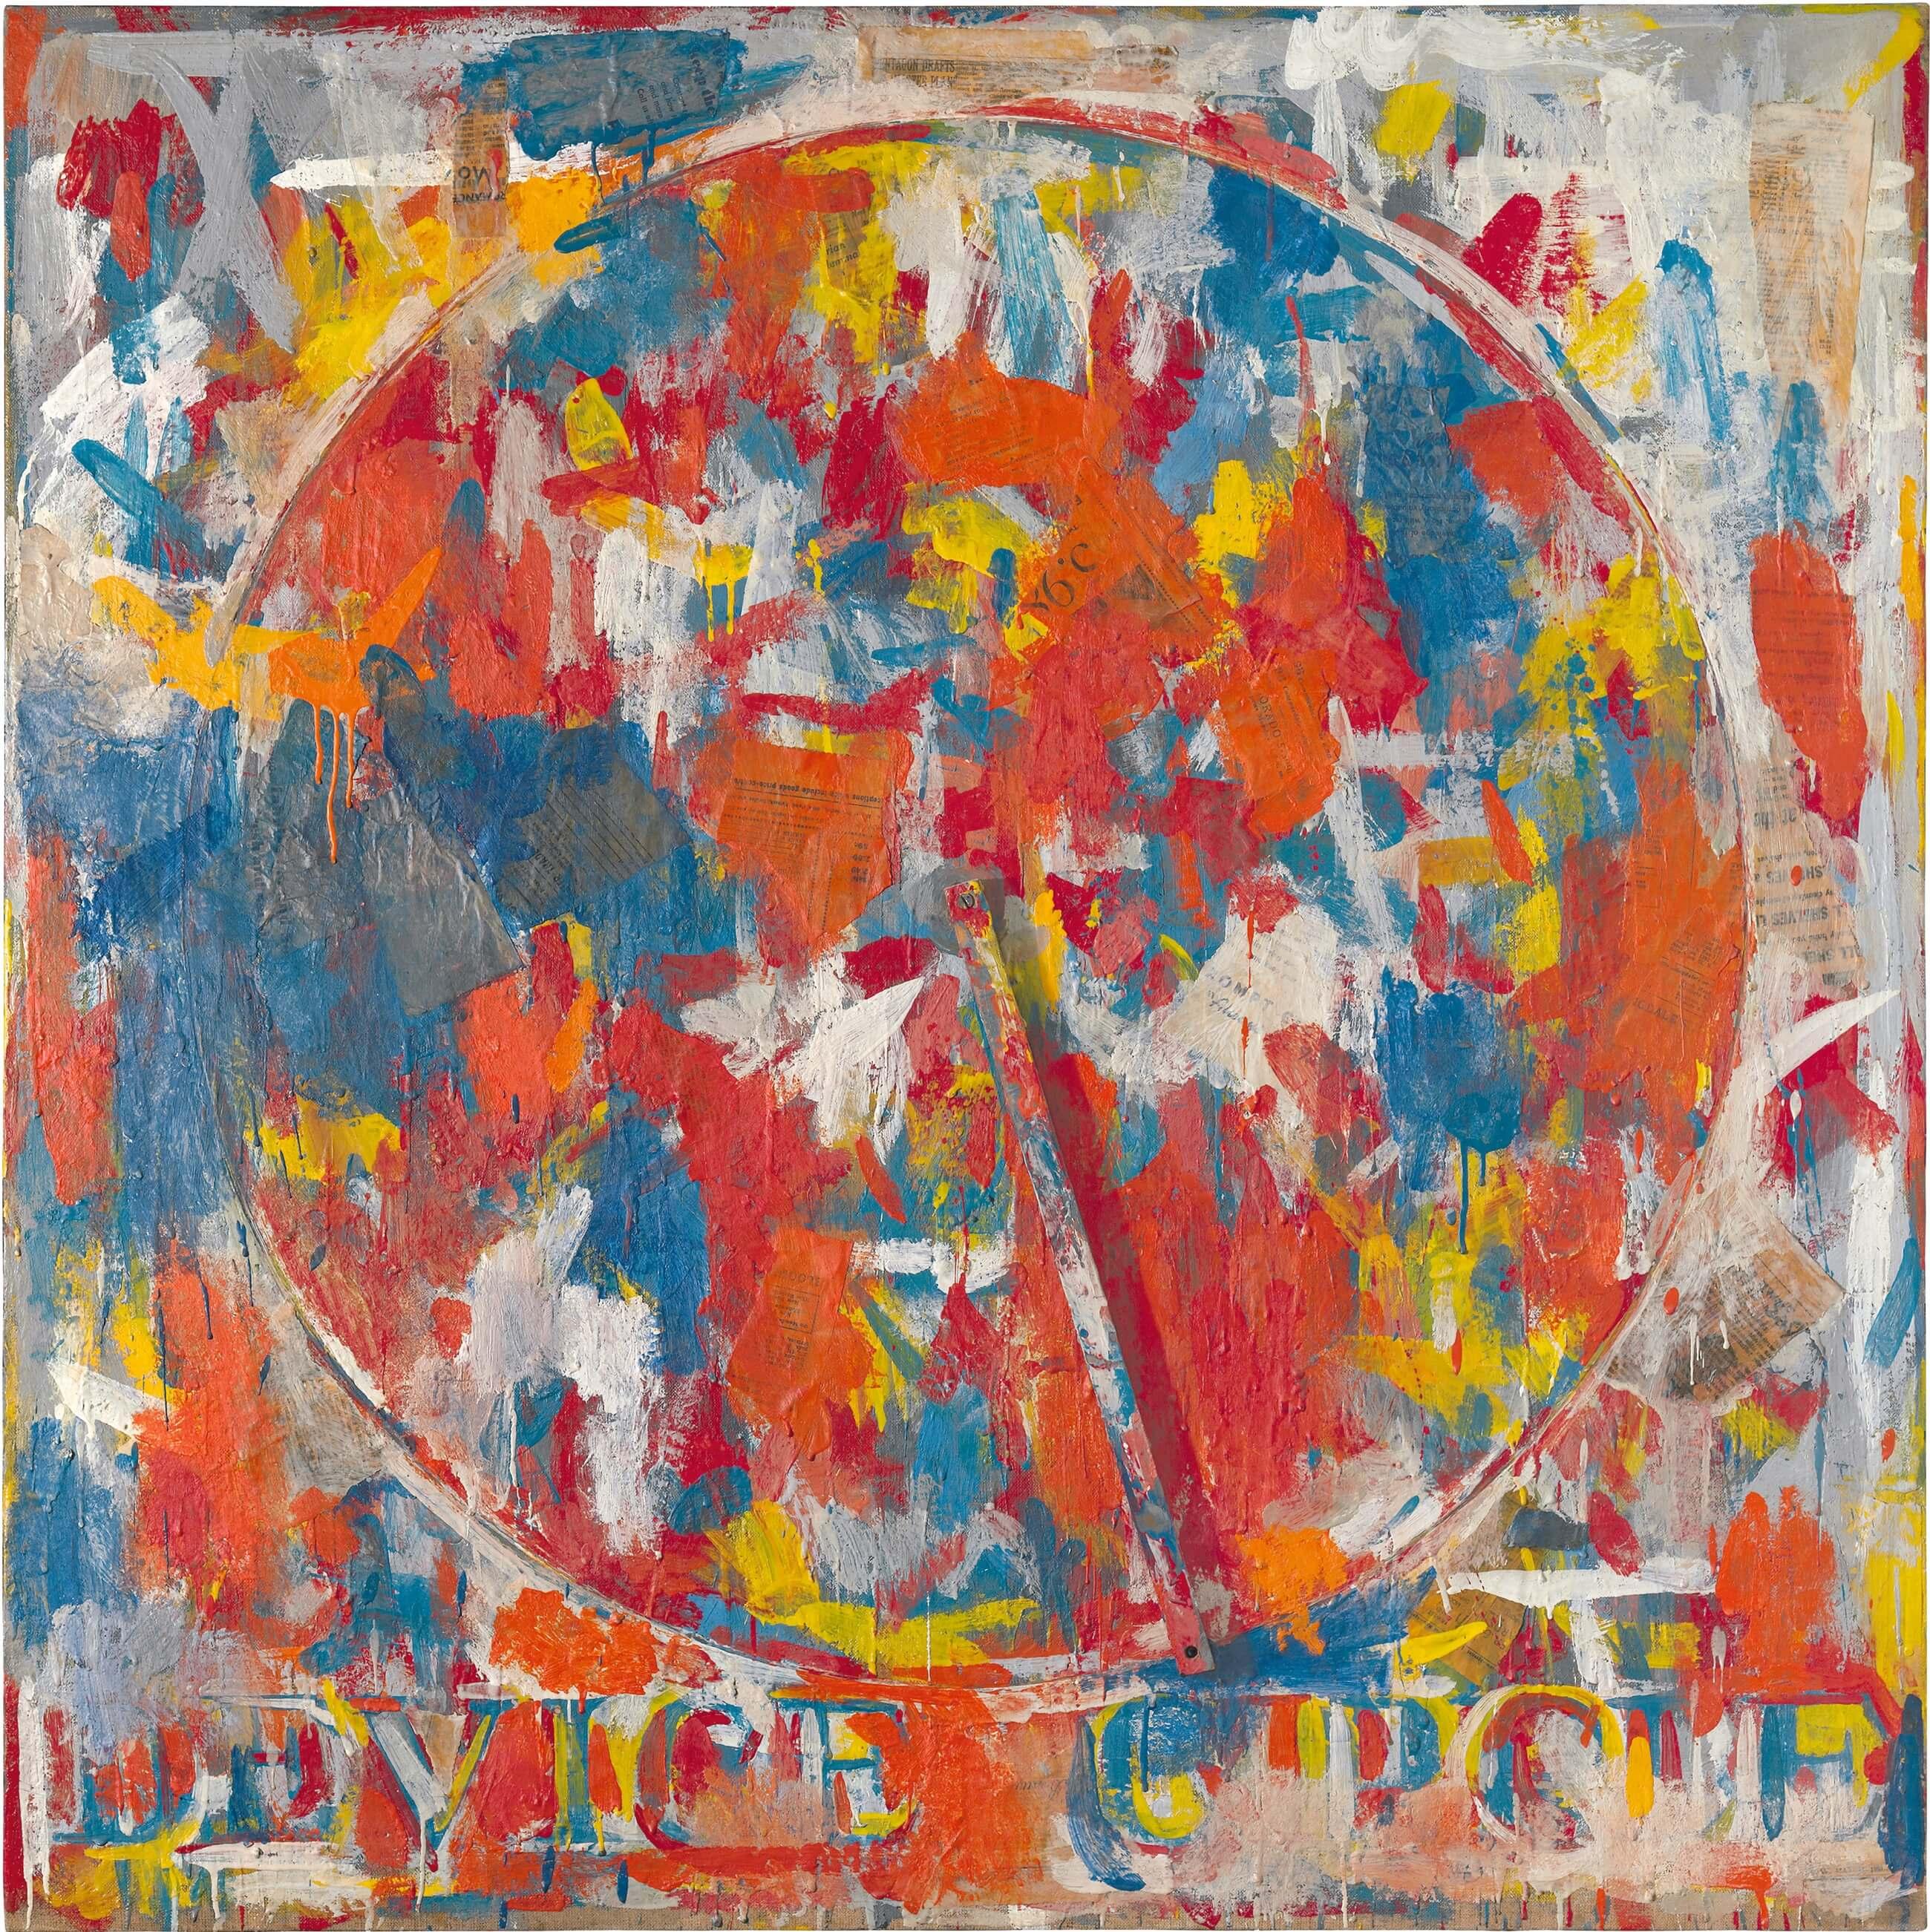 Device Circle, 1959, by Jasper Johns